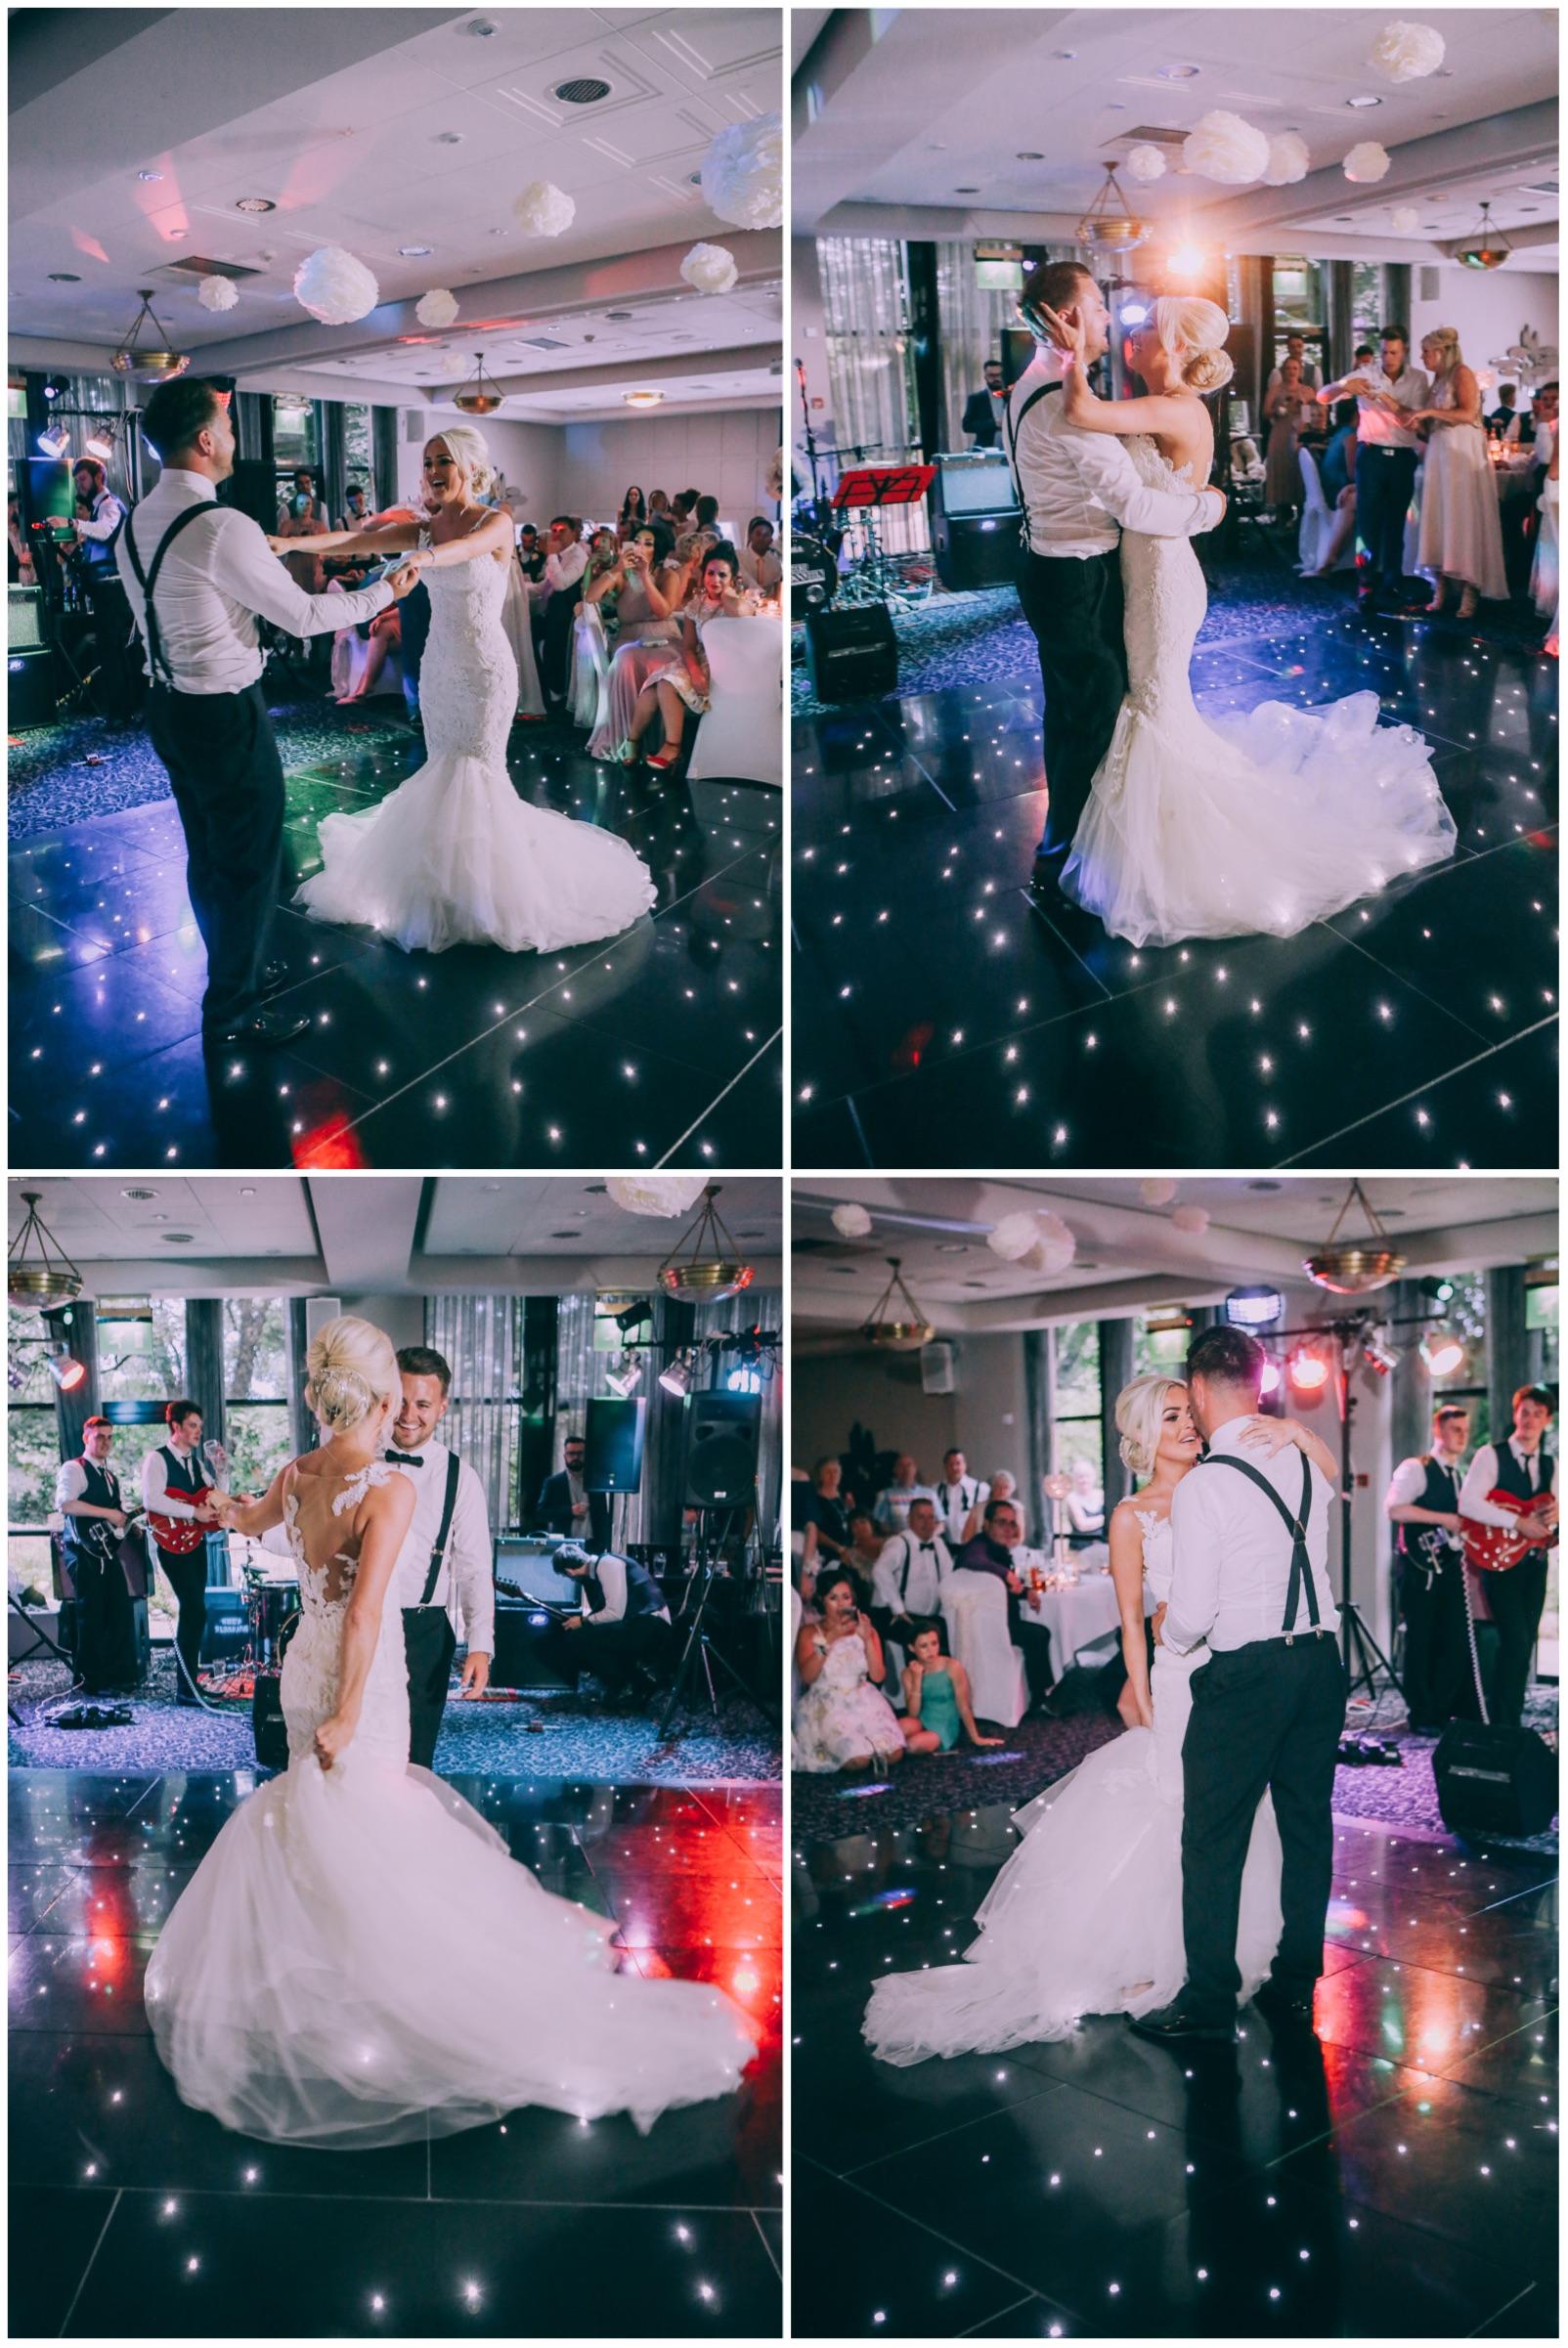 Wedding venue Hire dance floor - lake district